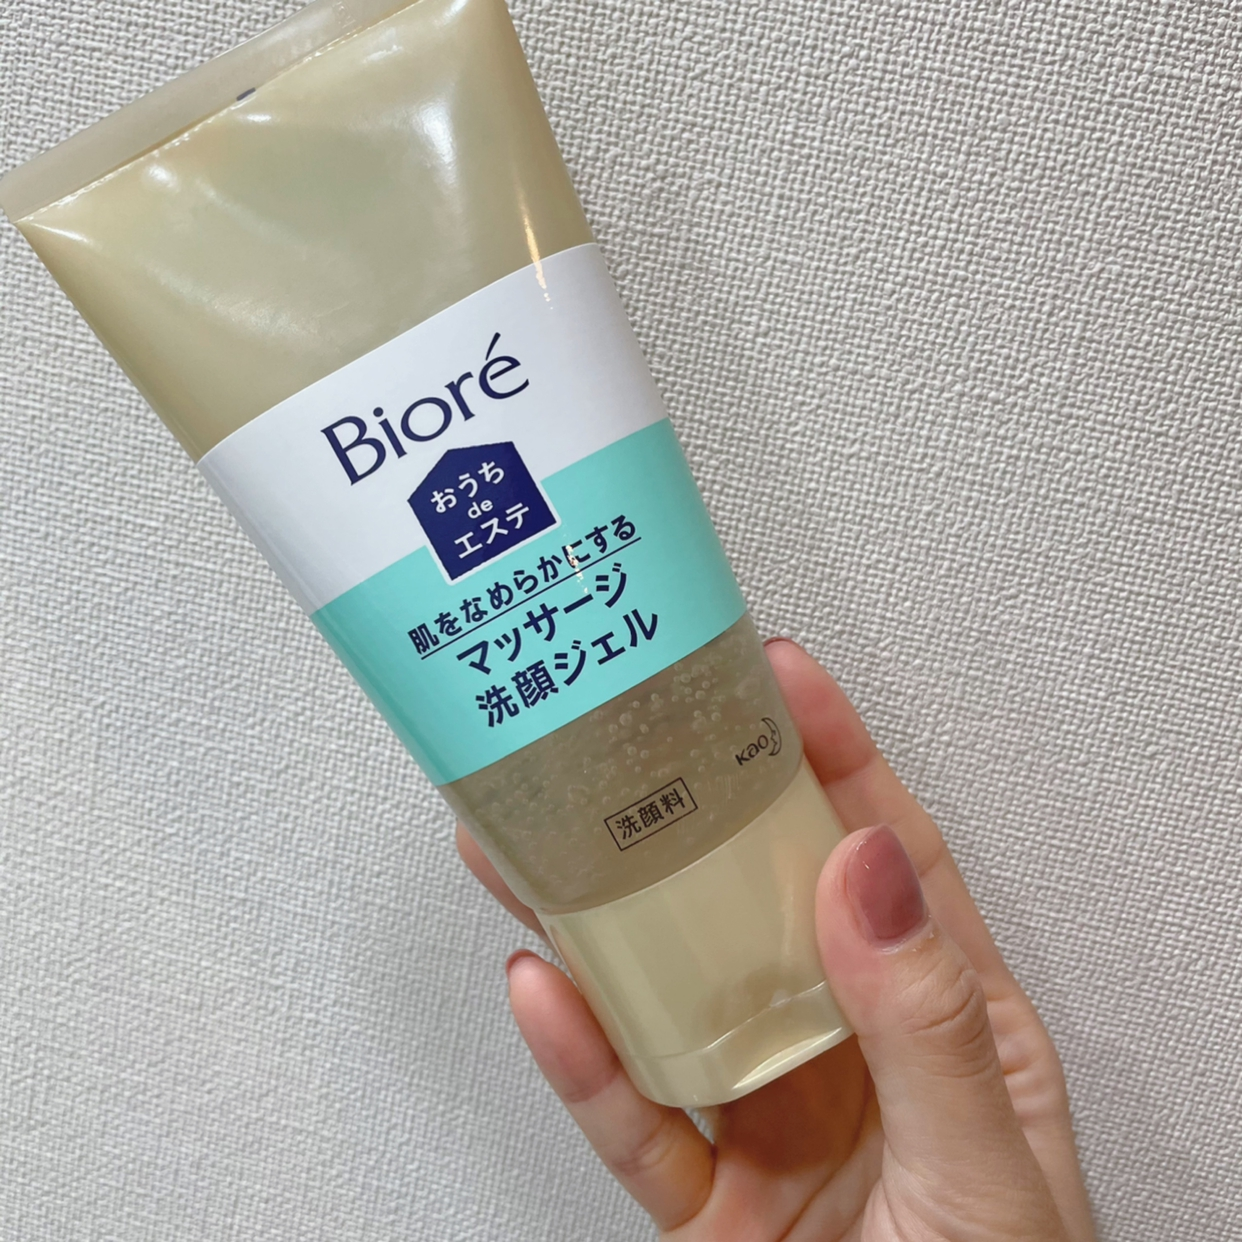 Bioré(ビオレ)洗顔ジェル なめらかを使ったYUUMIさんのクチコミ画像